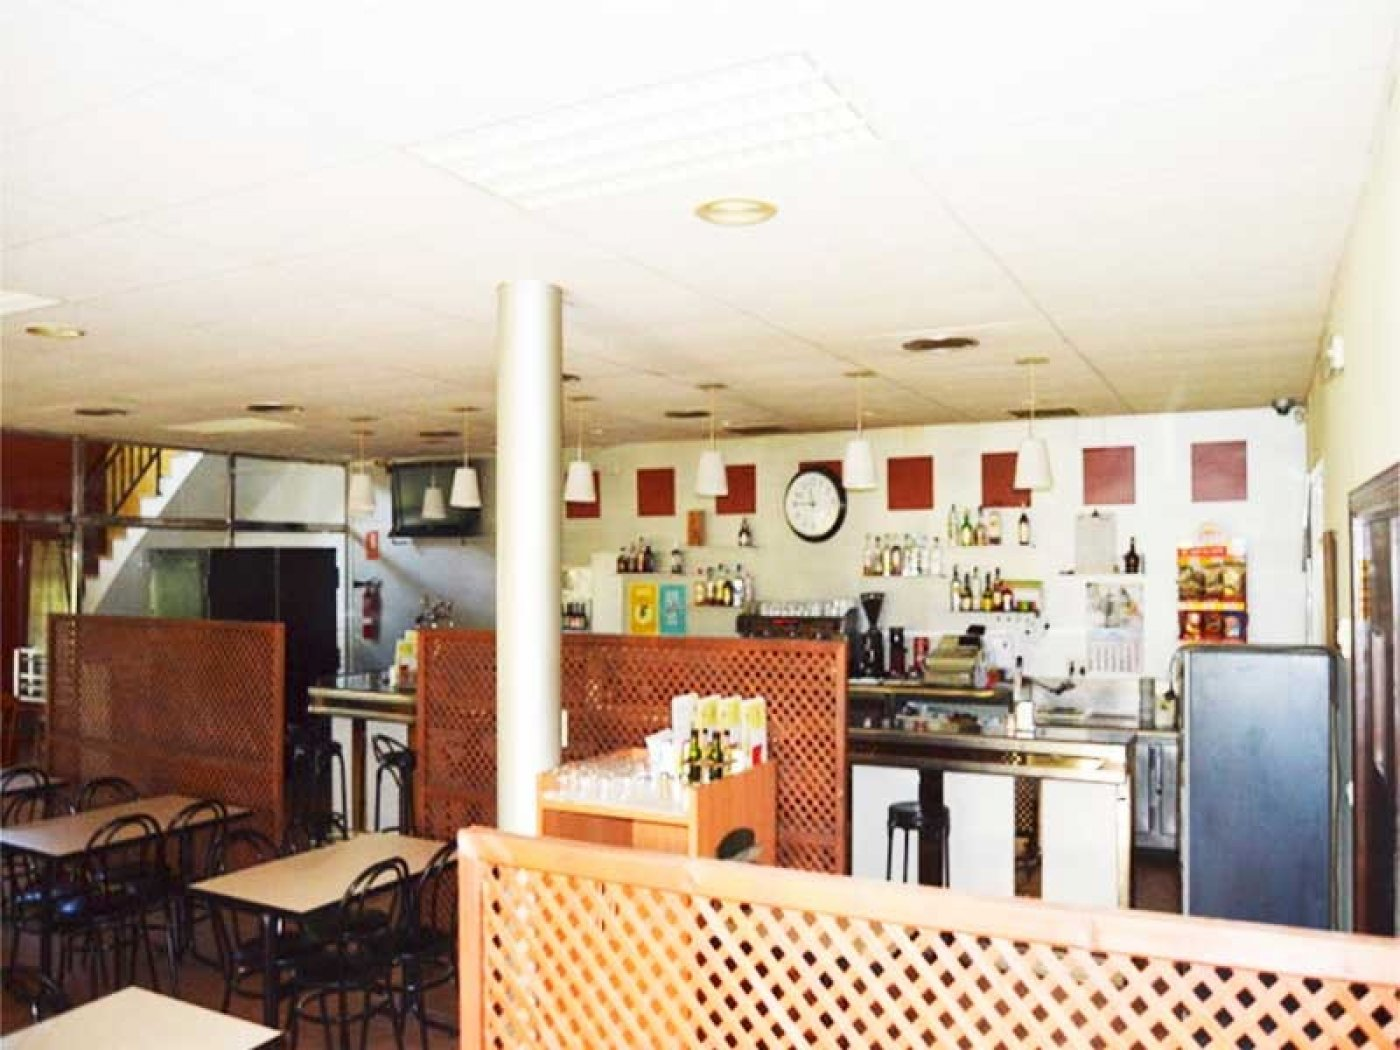 Nave restaurante en polígono cerca de sant sadurní d´anoia - imagenInmueble12